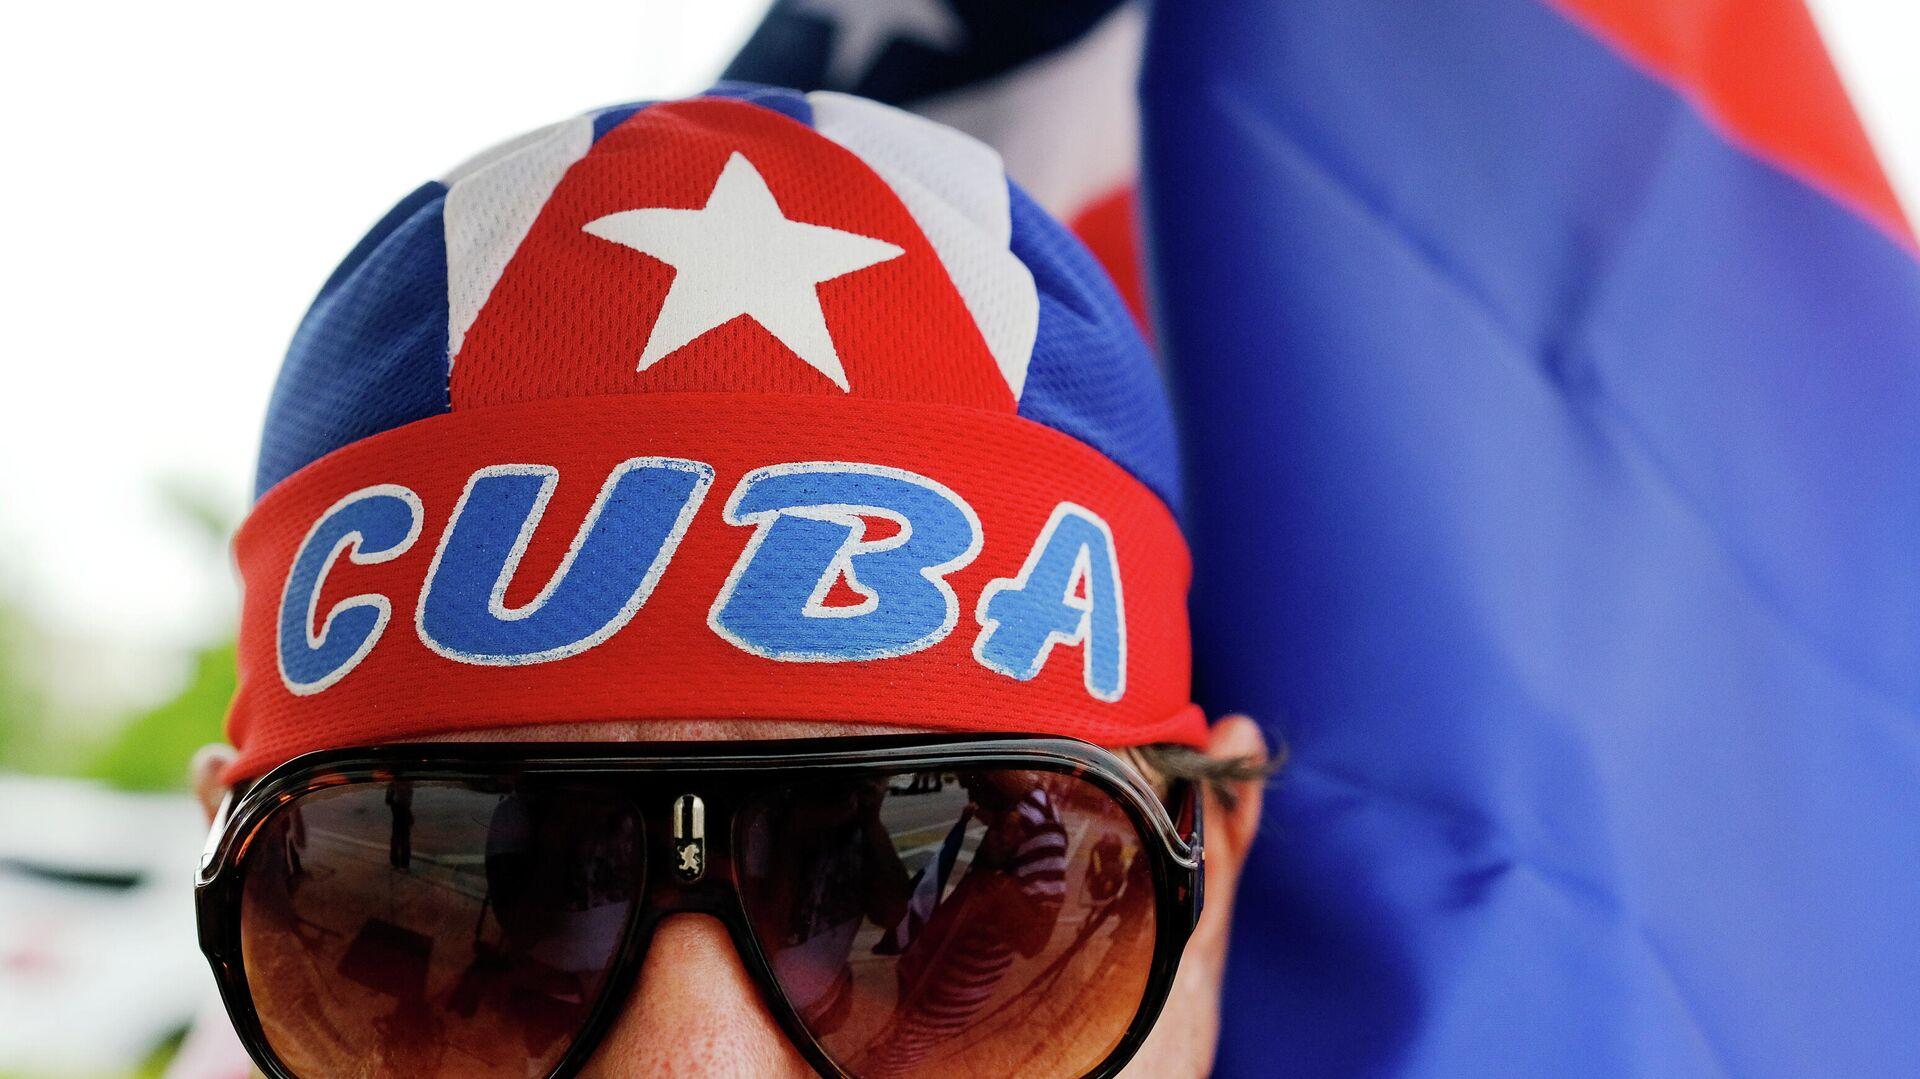 Bandera de Cuba - Sputnik Mundo, 1920, 14.07.2021